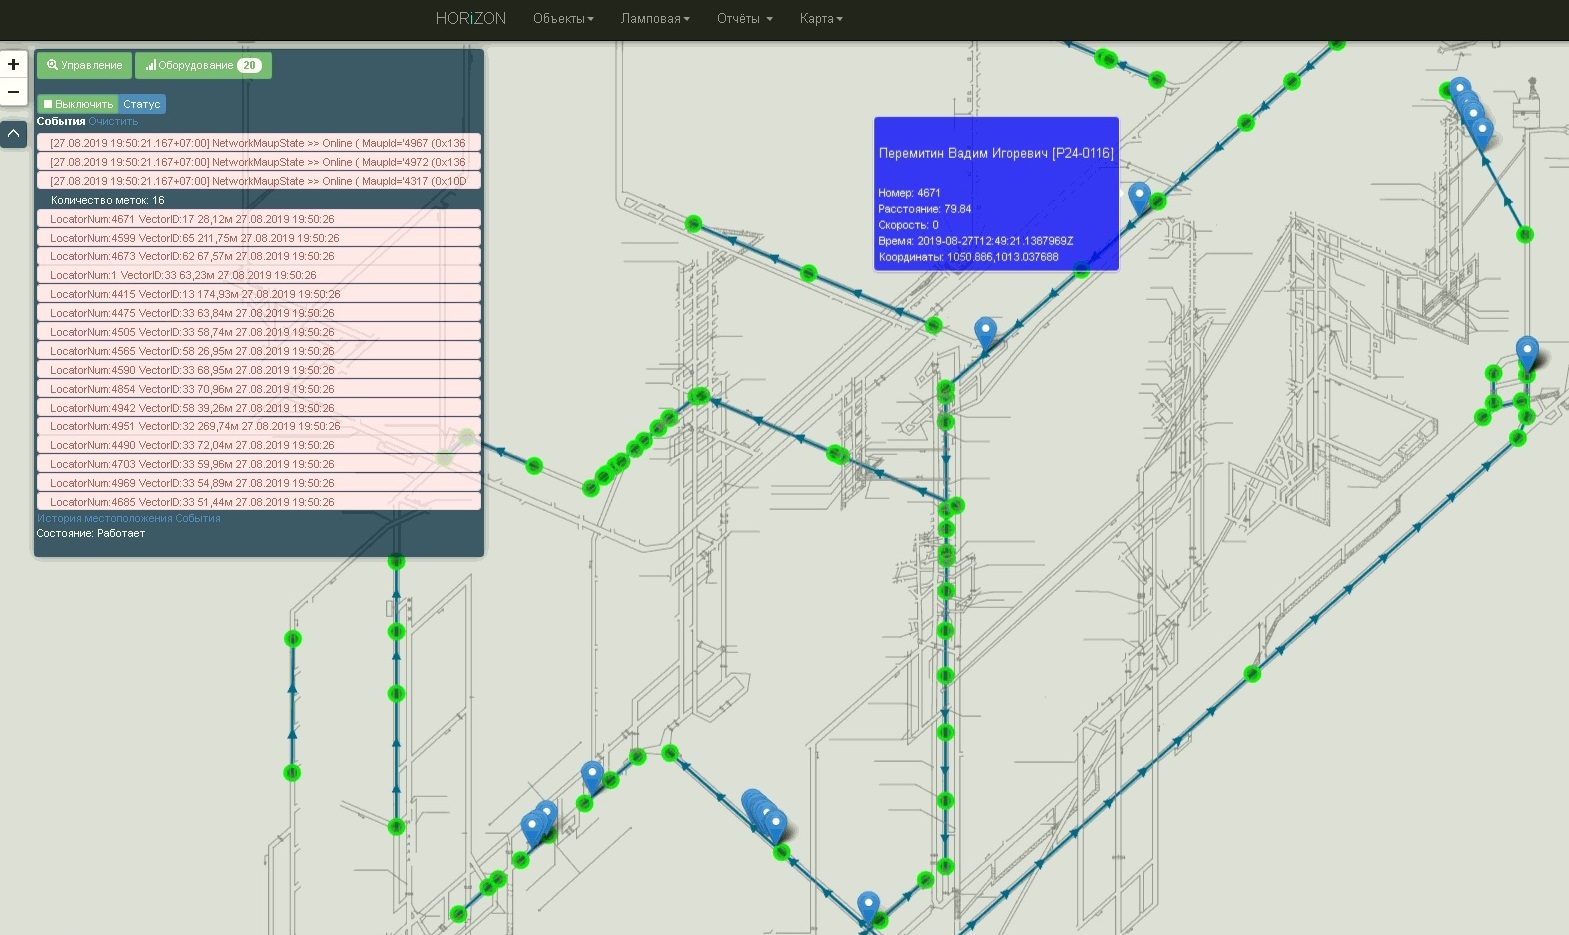 Внешний вид ПО «Горизонт» на экране АРМ оператора шахты